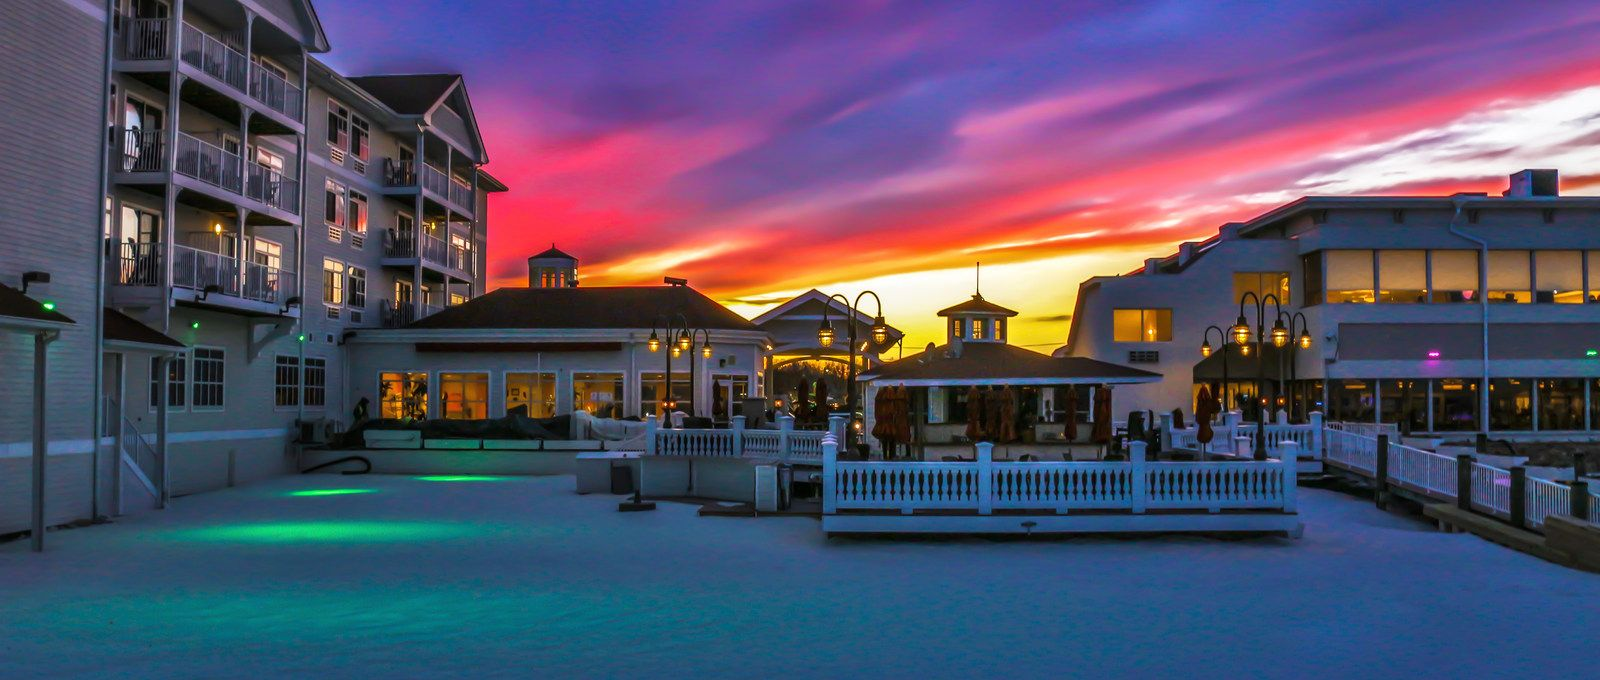 Chesapeake Bay Hotels Beach Resort Spa Stay Overnight Spring Summer Fall